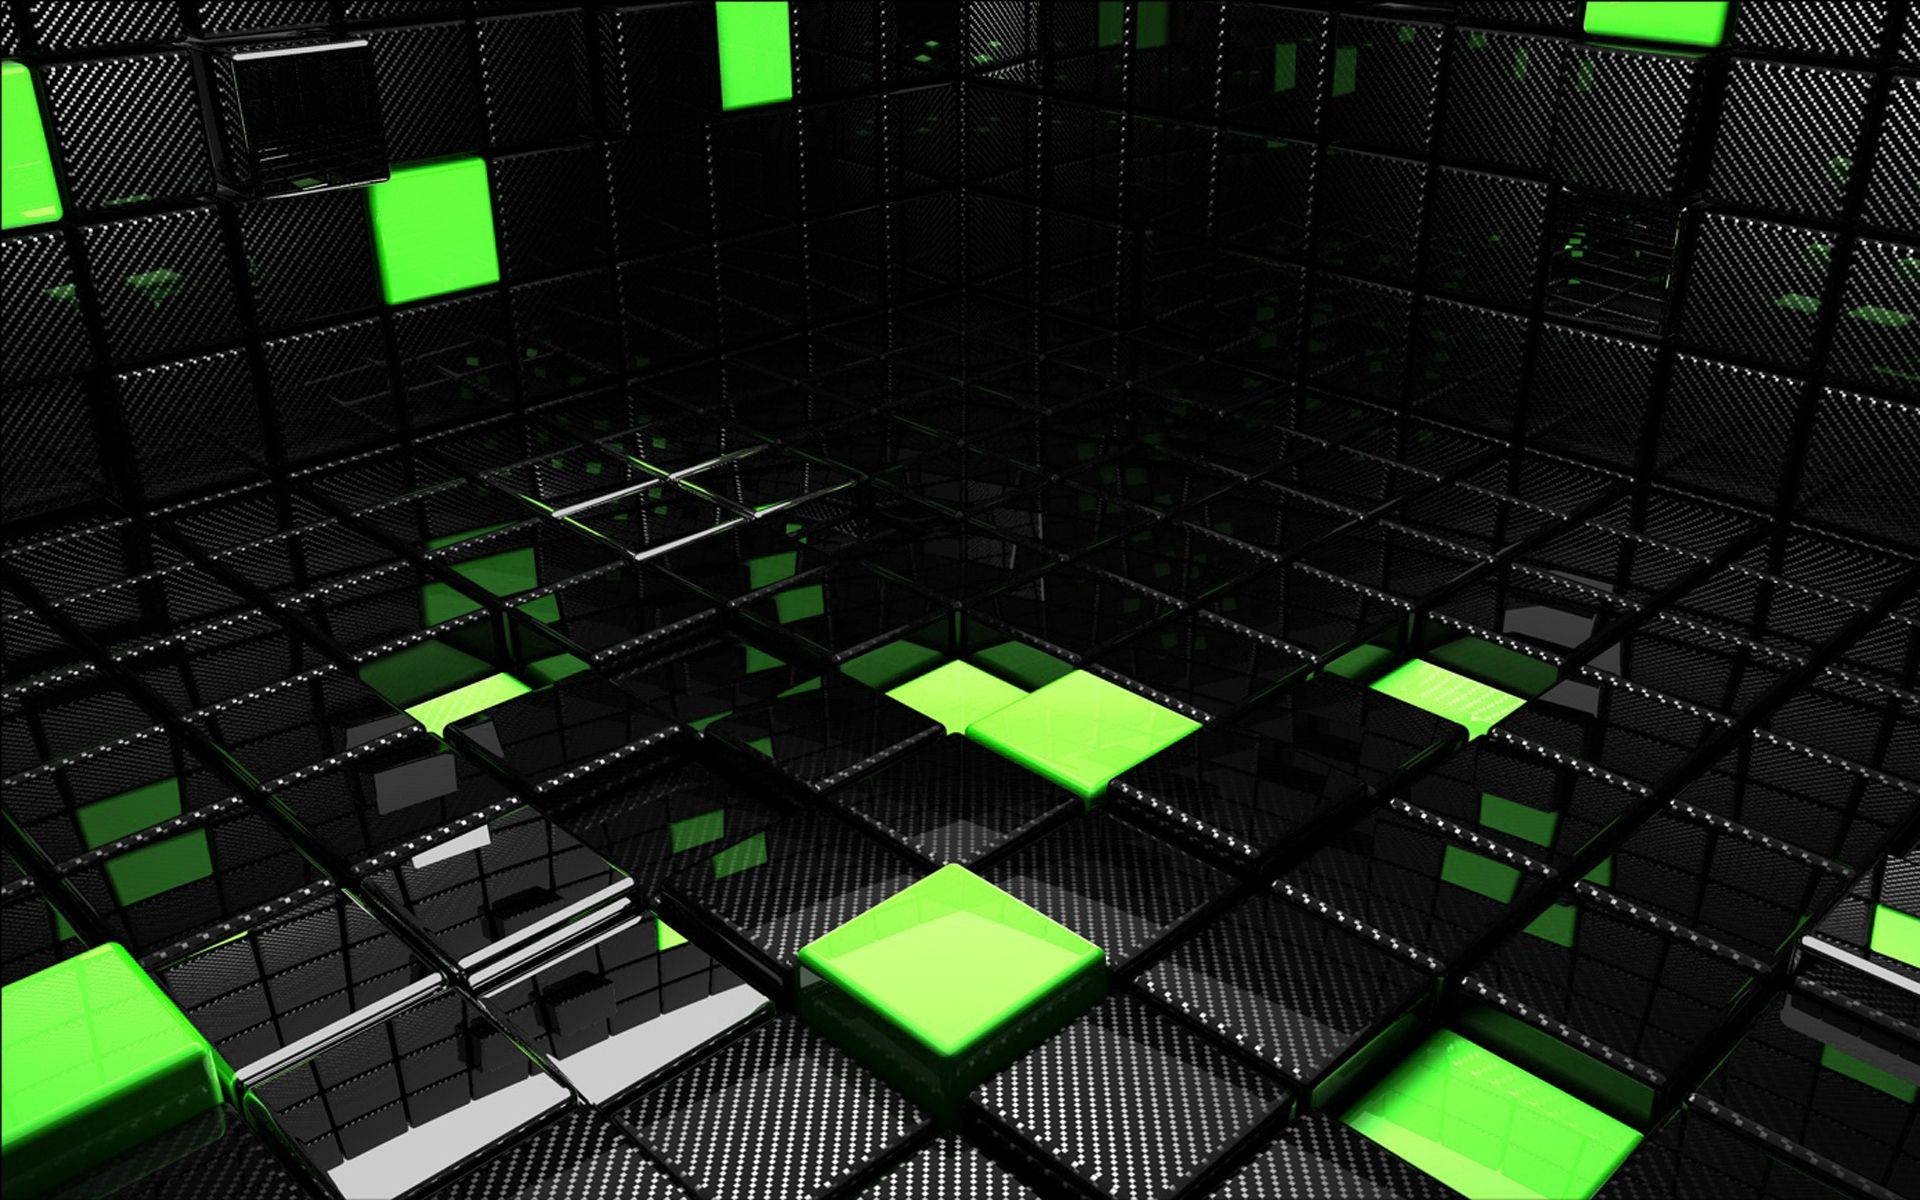 Papel De Parede Cubes Cubos Quadrados Preto Verde 3d Ps